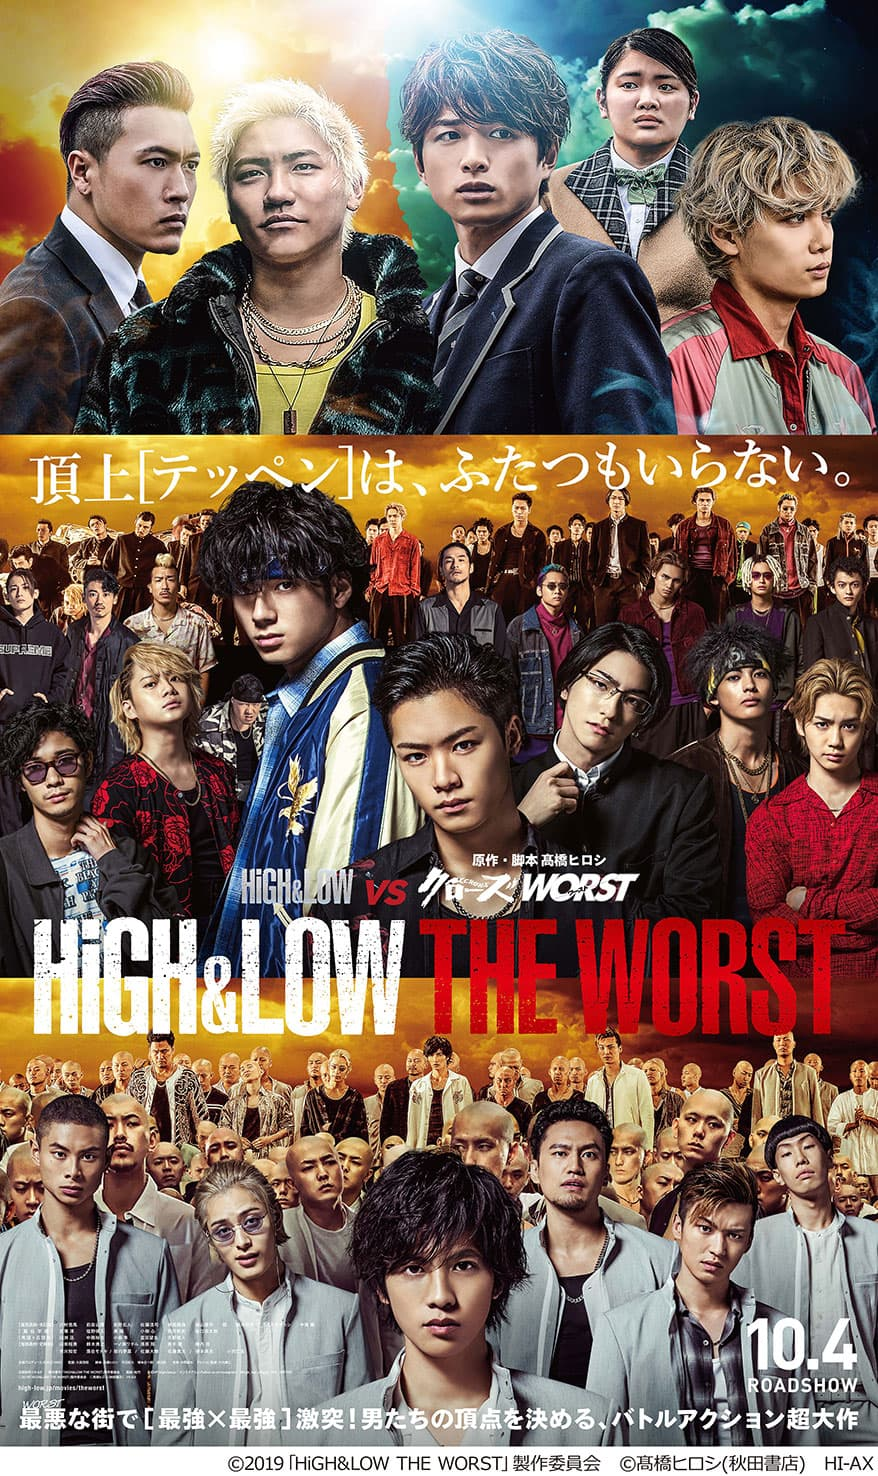 High & Low The Worst (2019) Sub Indo - MegaBatch